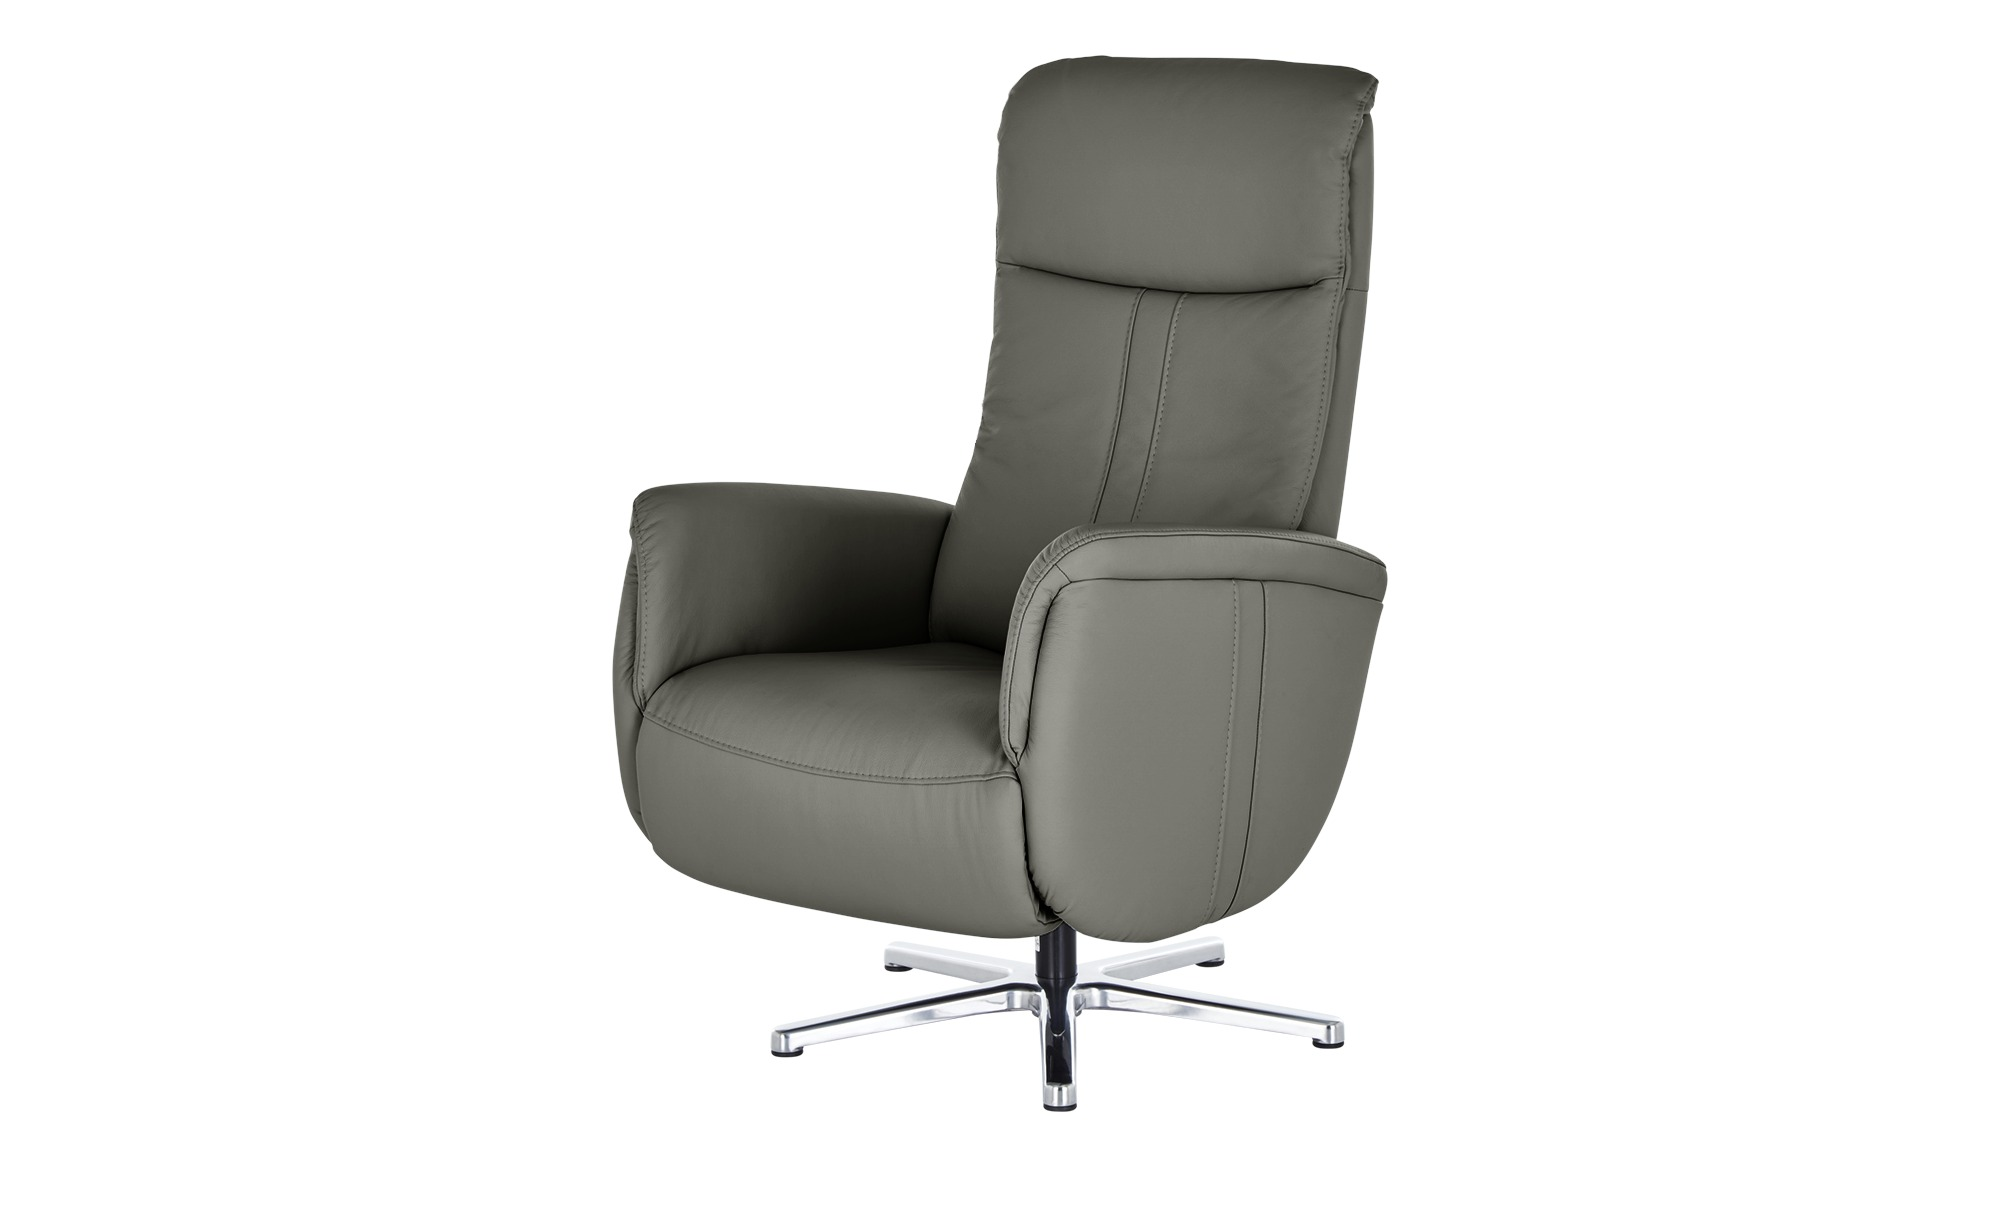 meinSofa Relaxsessel  Franzi-L ¦ grau ¦ Maße (cm): B: 71 H: 112 T: 83 Polstermöbel > Sessel > Fernsehsessel - Höffner